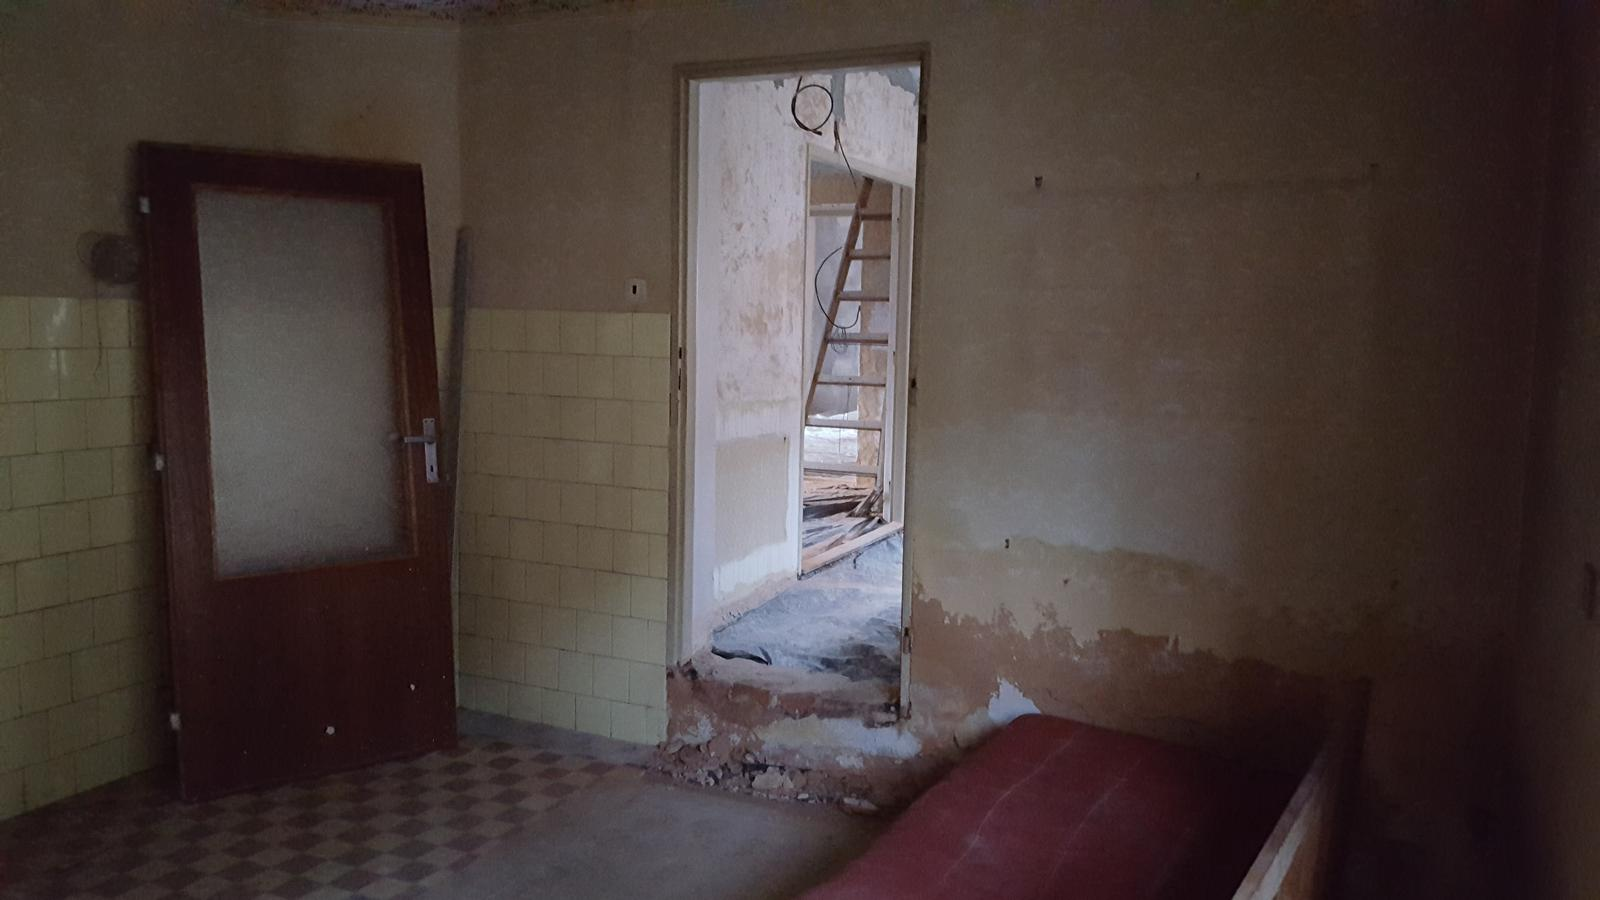 Prerabka domu v historickom centre - dvere sa musia kvoli skrini v predizbe posunut o cca meter doprava takze sa musi vyburat novy otvor a povodny zamurovat,kde su oprene dvere pojde vyvod noveho komina